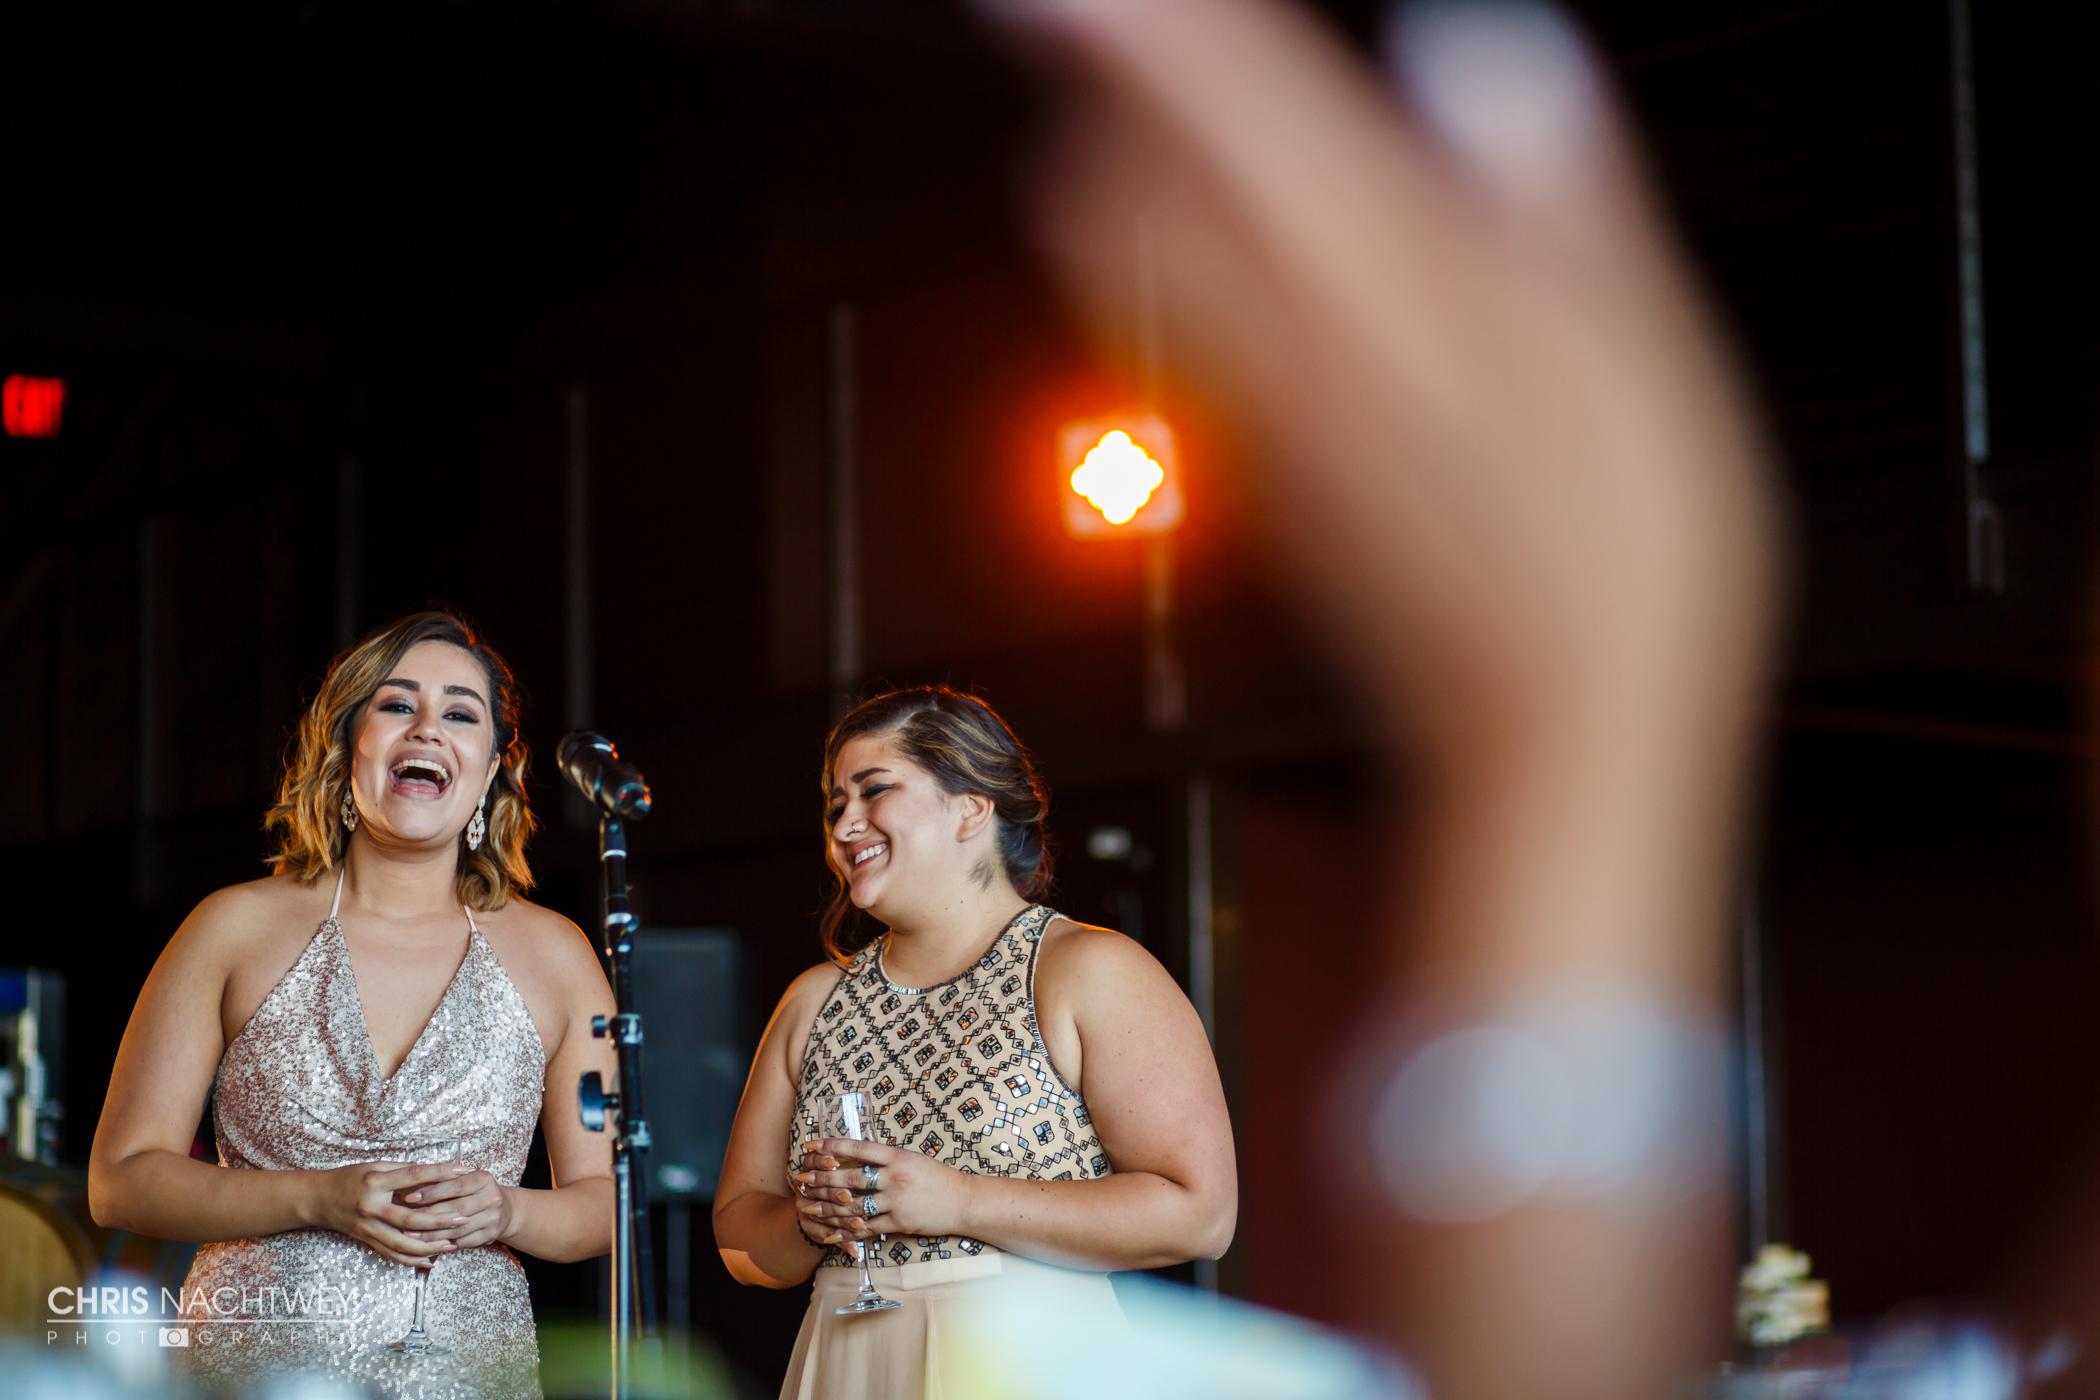 wedding-saltwater-farm-vineyard-photos-stonington-ct-chris-nachtwey-photography-2016-ana-austin-32.jpg